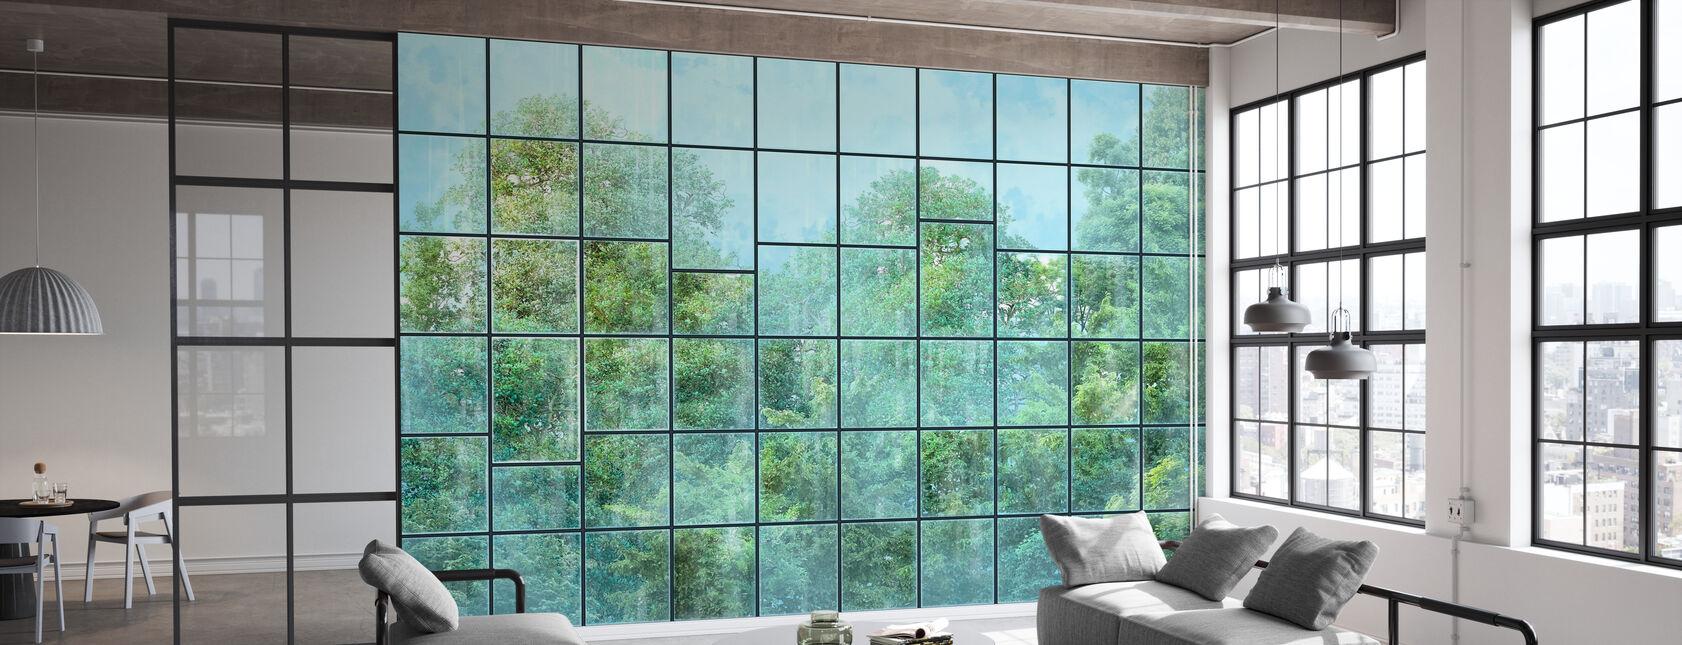 Windows View - Black - Wallpaper - Office